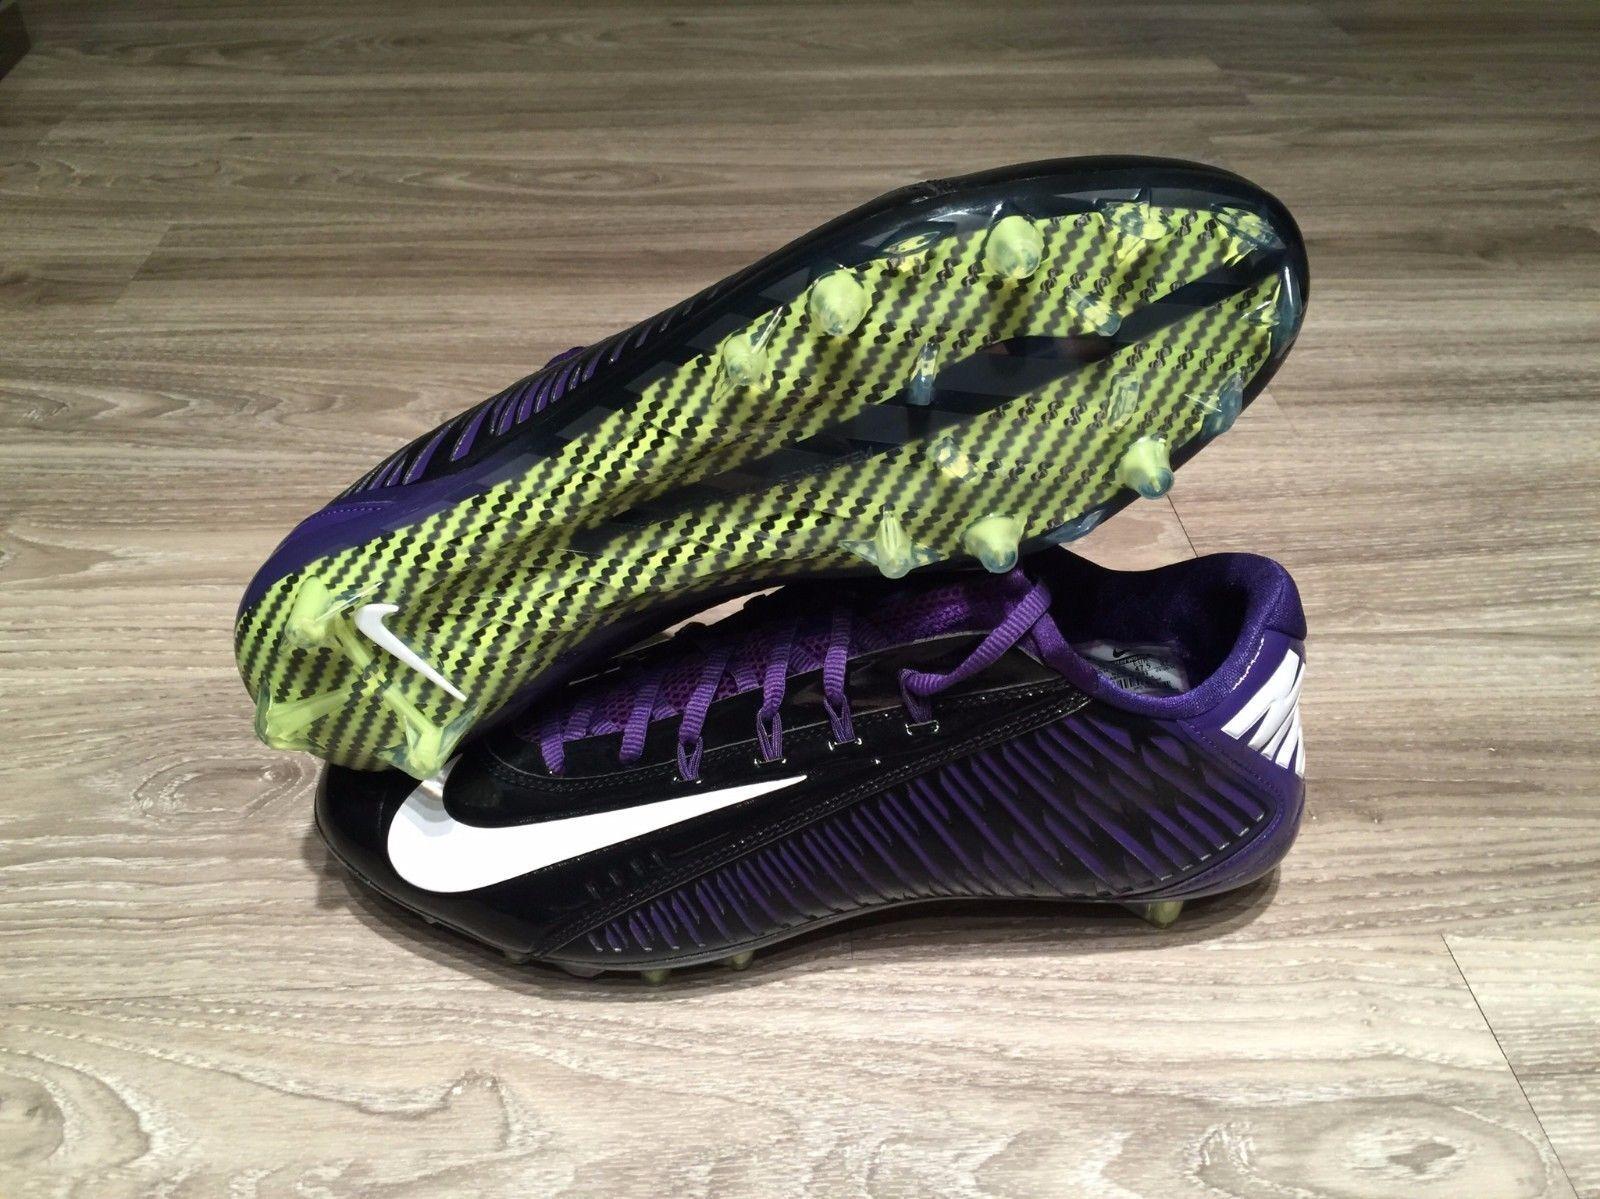 Nike Vapor Carbon Fiber Elite 2 TD Football Cleats 13 Purple Black 657441-003